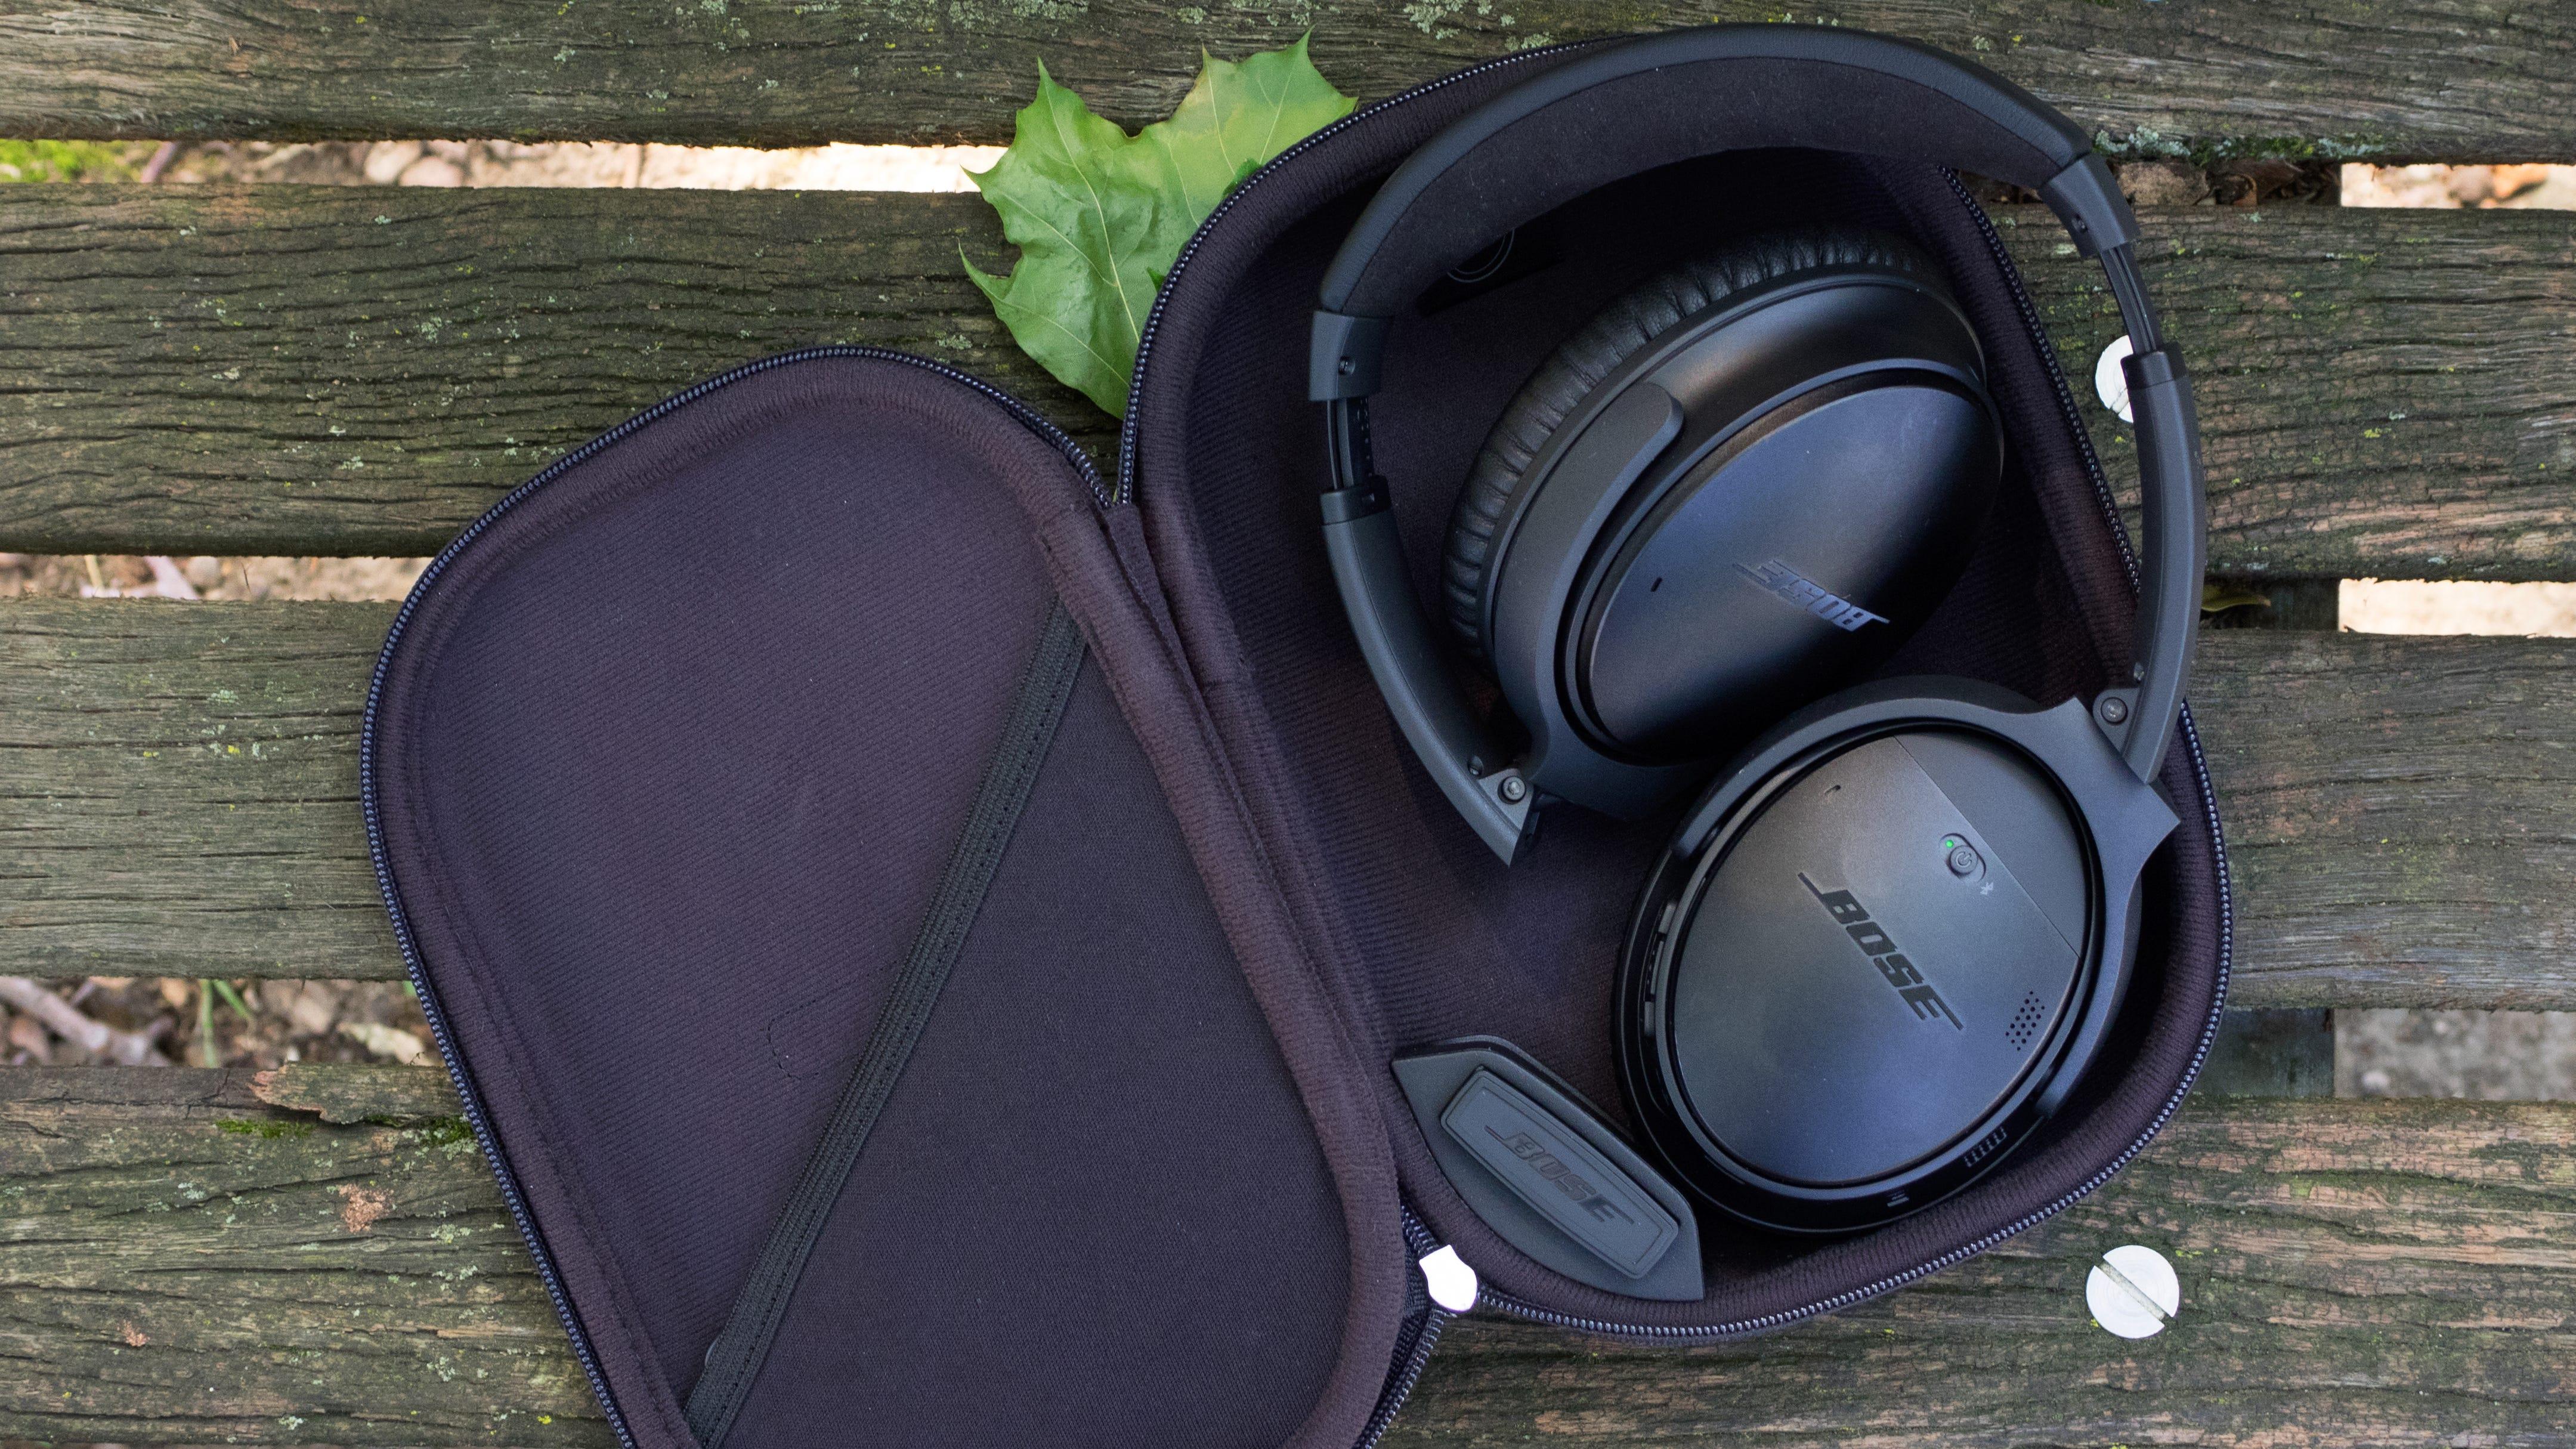 Black Friday 2020: Bose's legendary QC 35 II headphones are on super sale